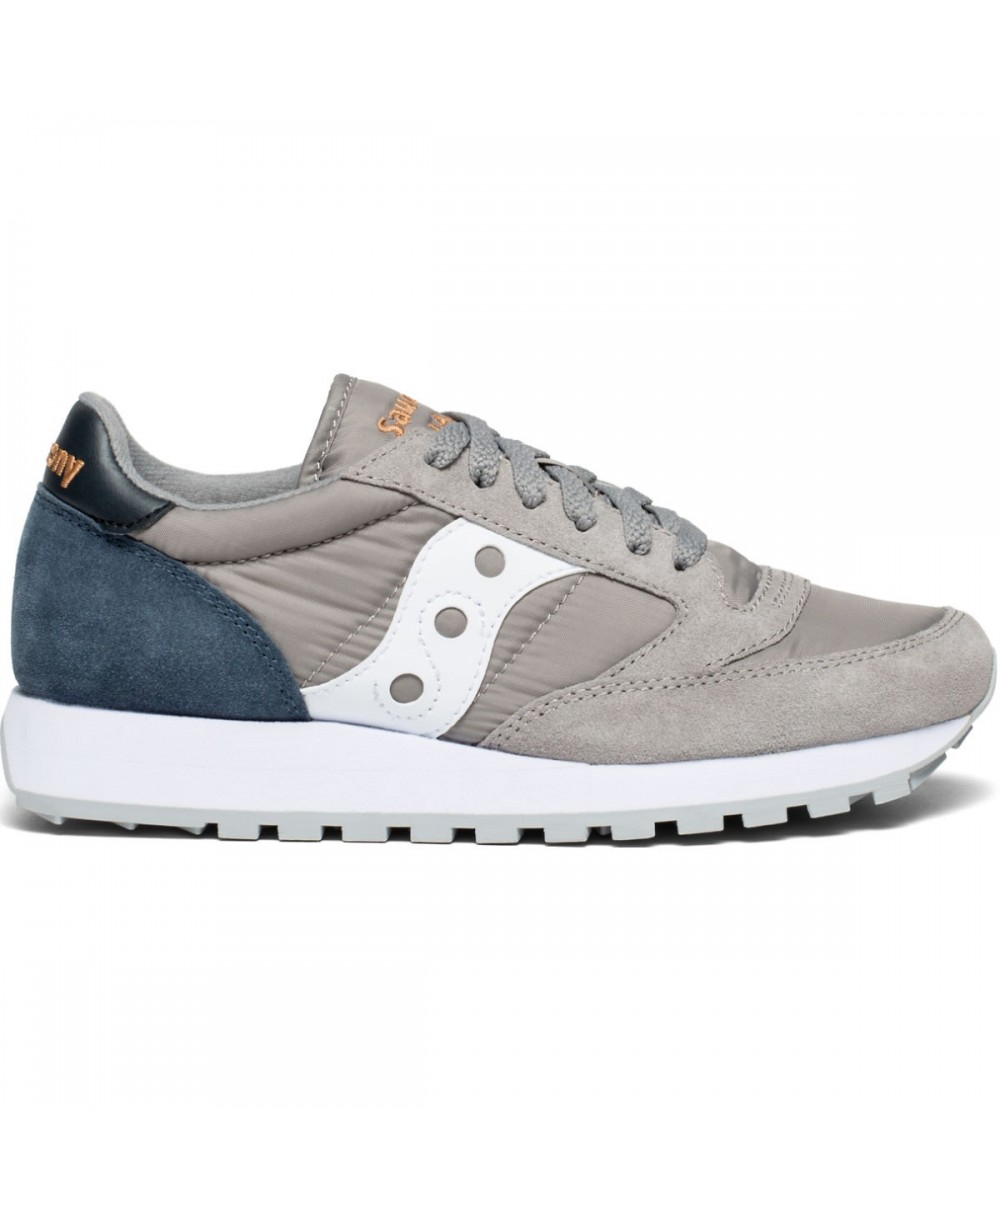 63c4a214d9e3 Saucony Women s Jazz Original Sneakers Shoes Grey Navy